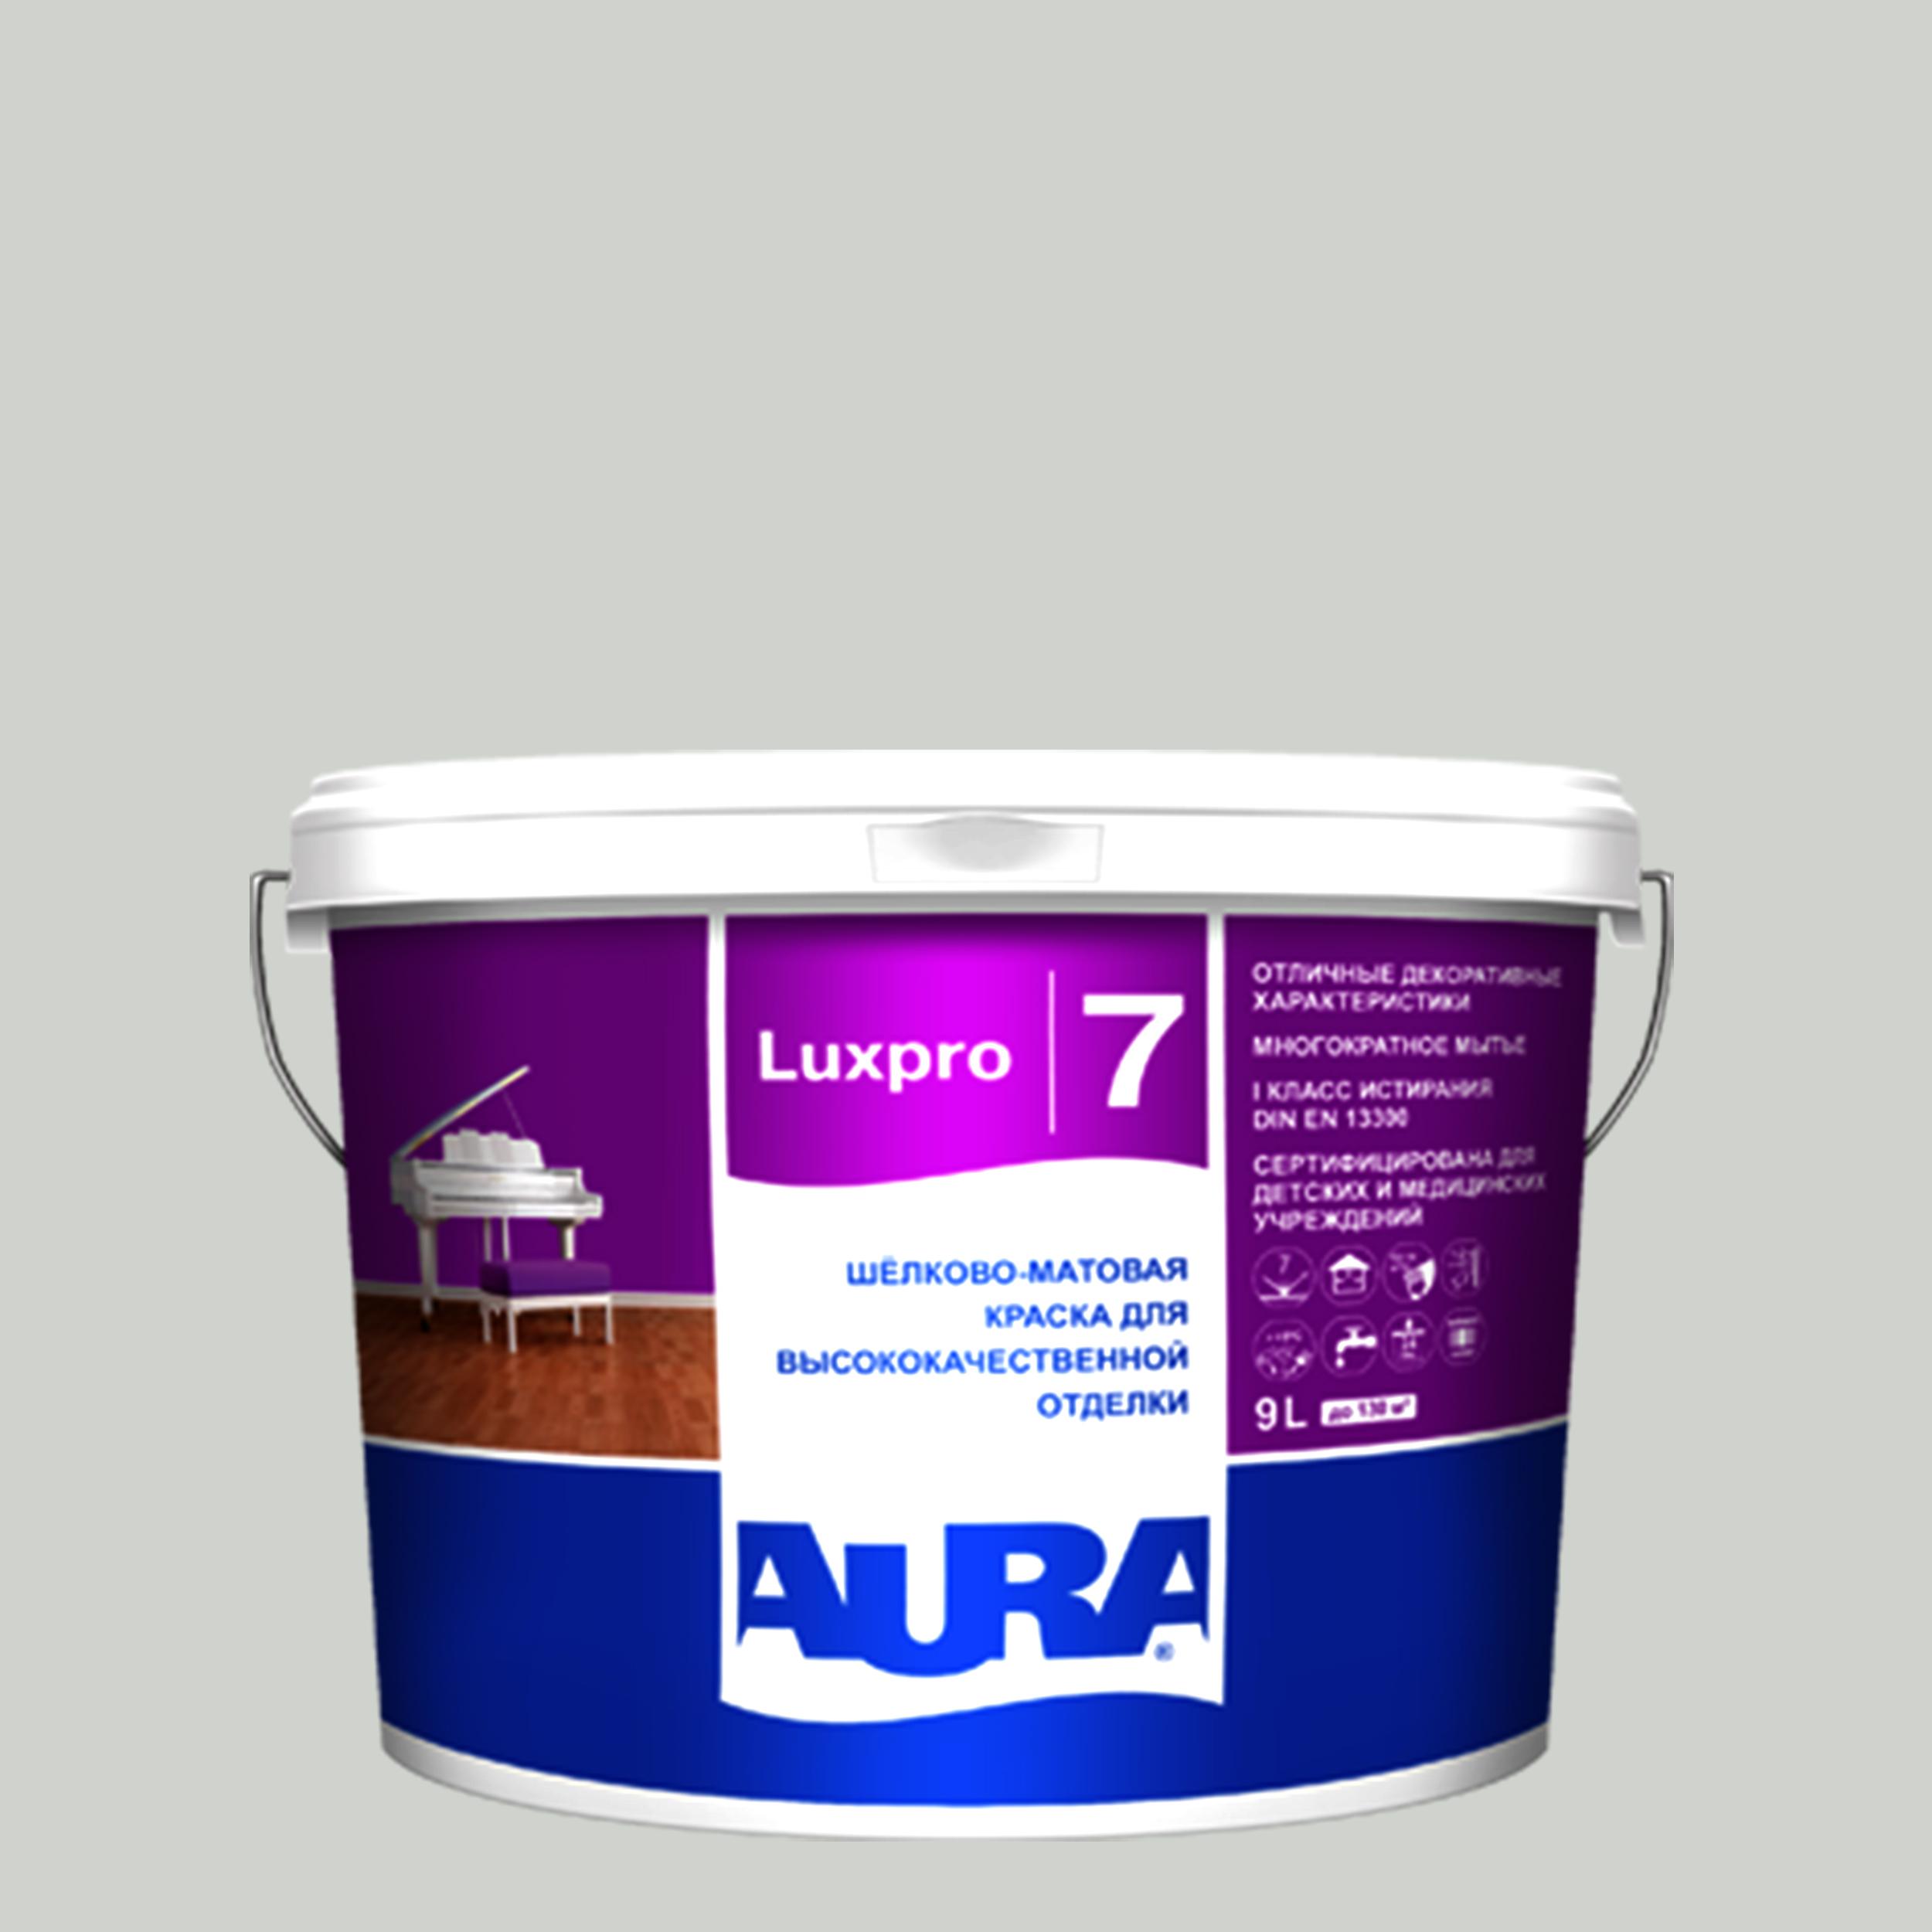 Фото 4 - Краска интерьерная, Aura LuxPRO 7, RAL 7045, 11 кг.